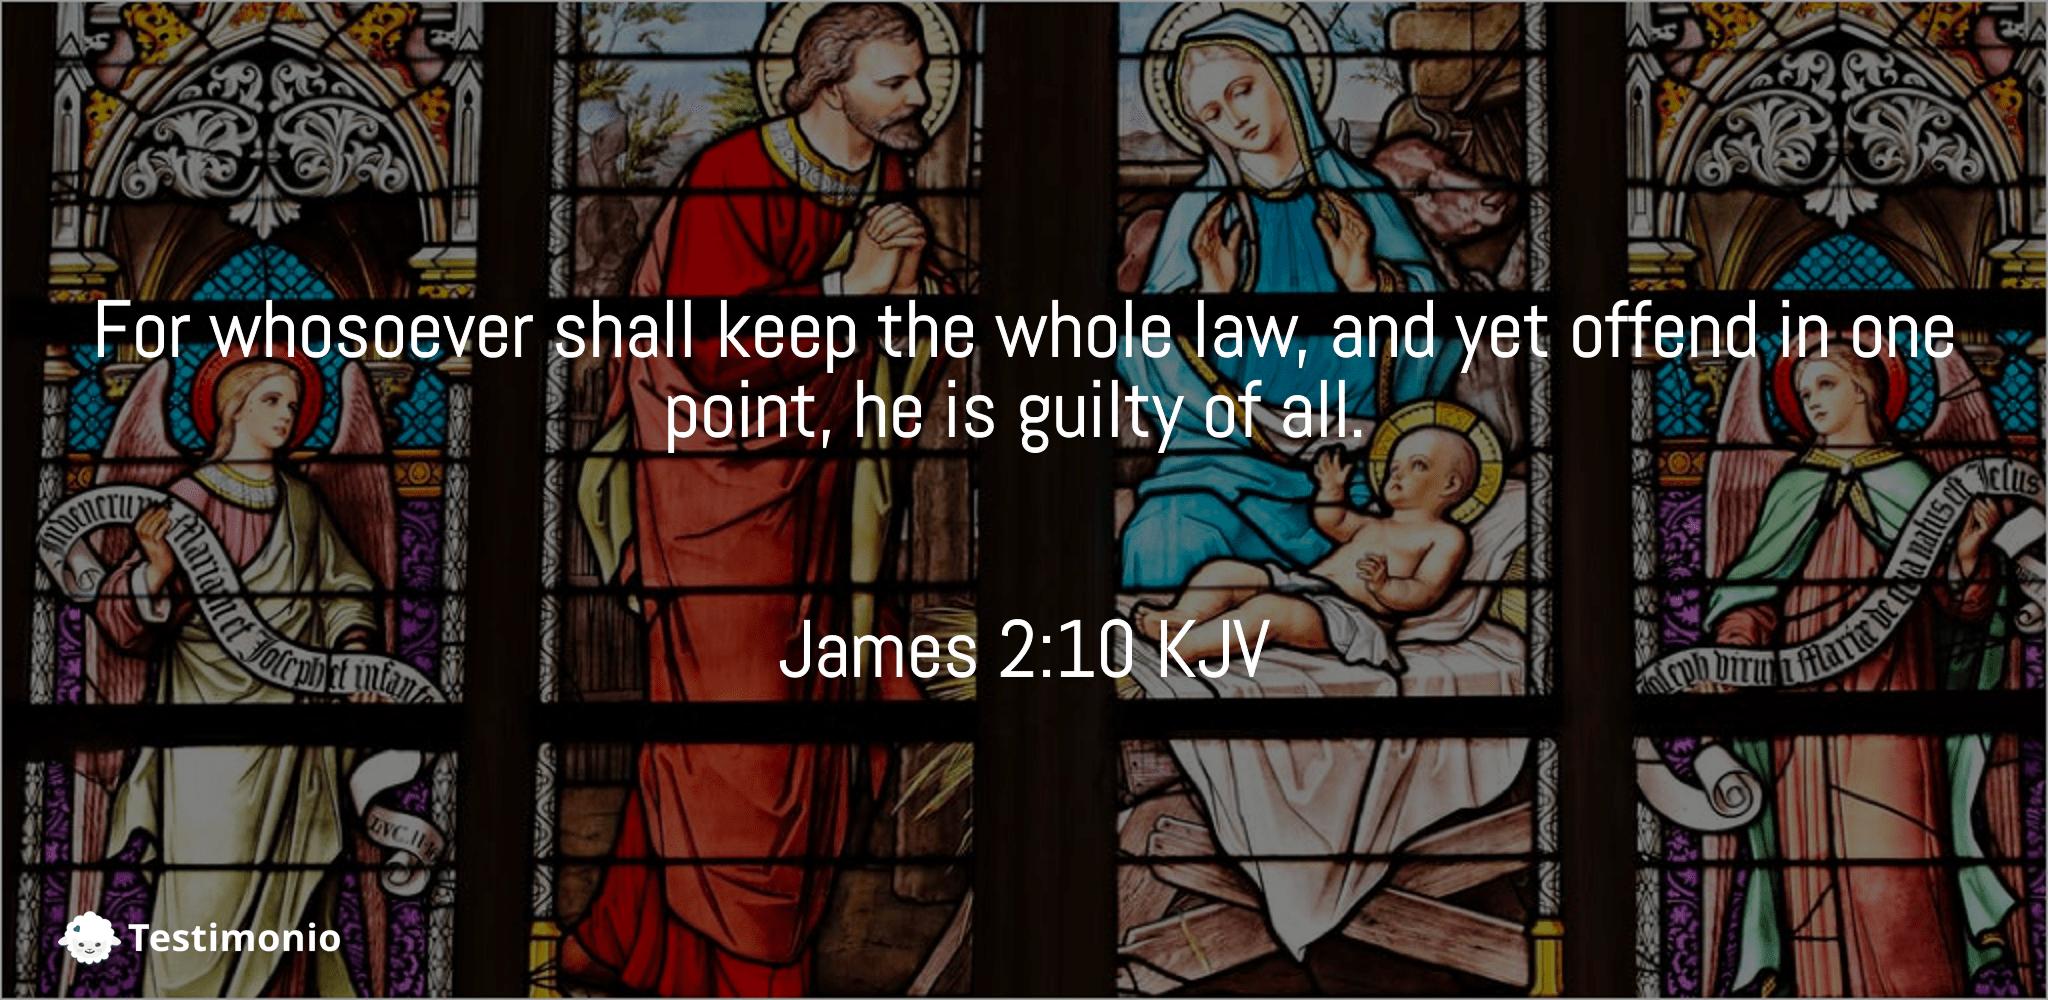 James 2:10